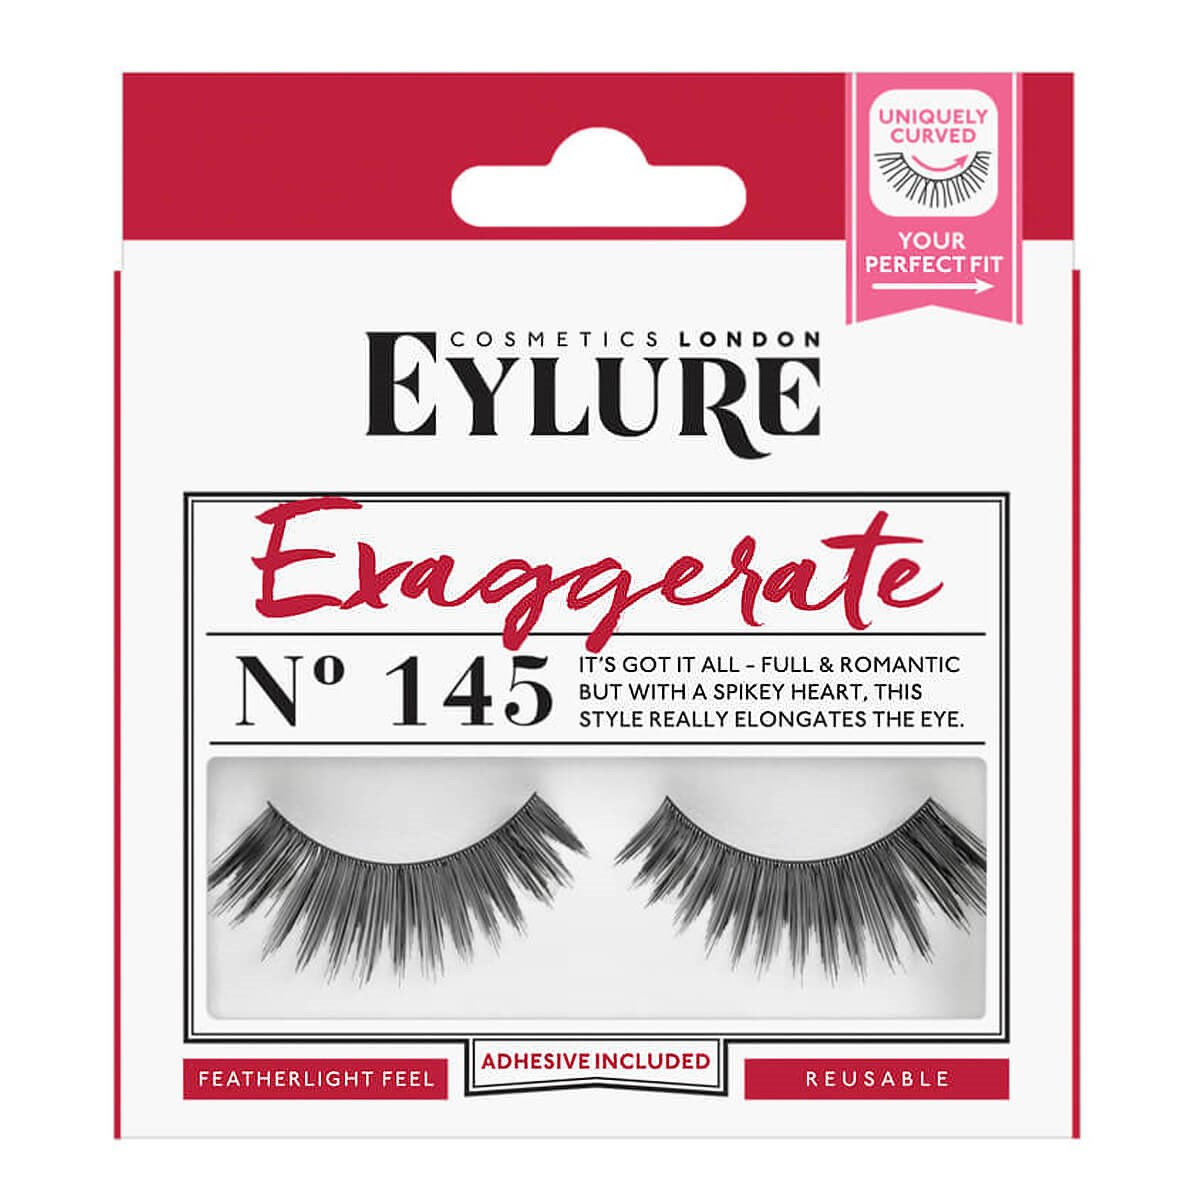 Eylure Exaggerate Lashes No.145